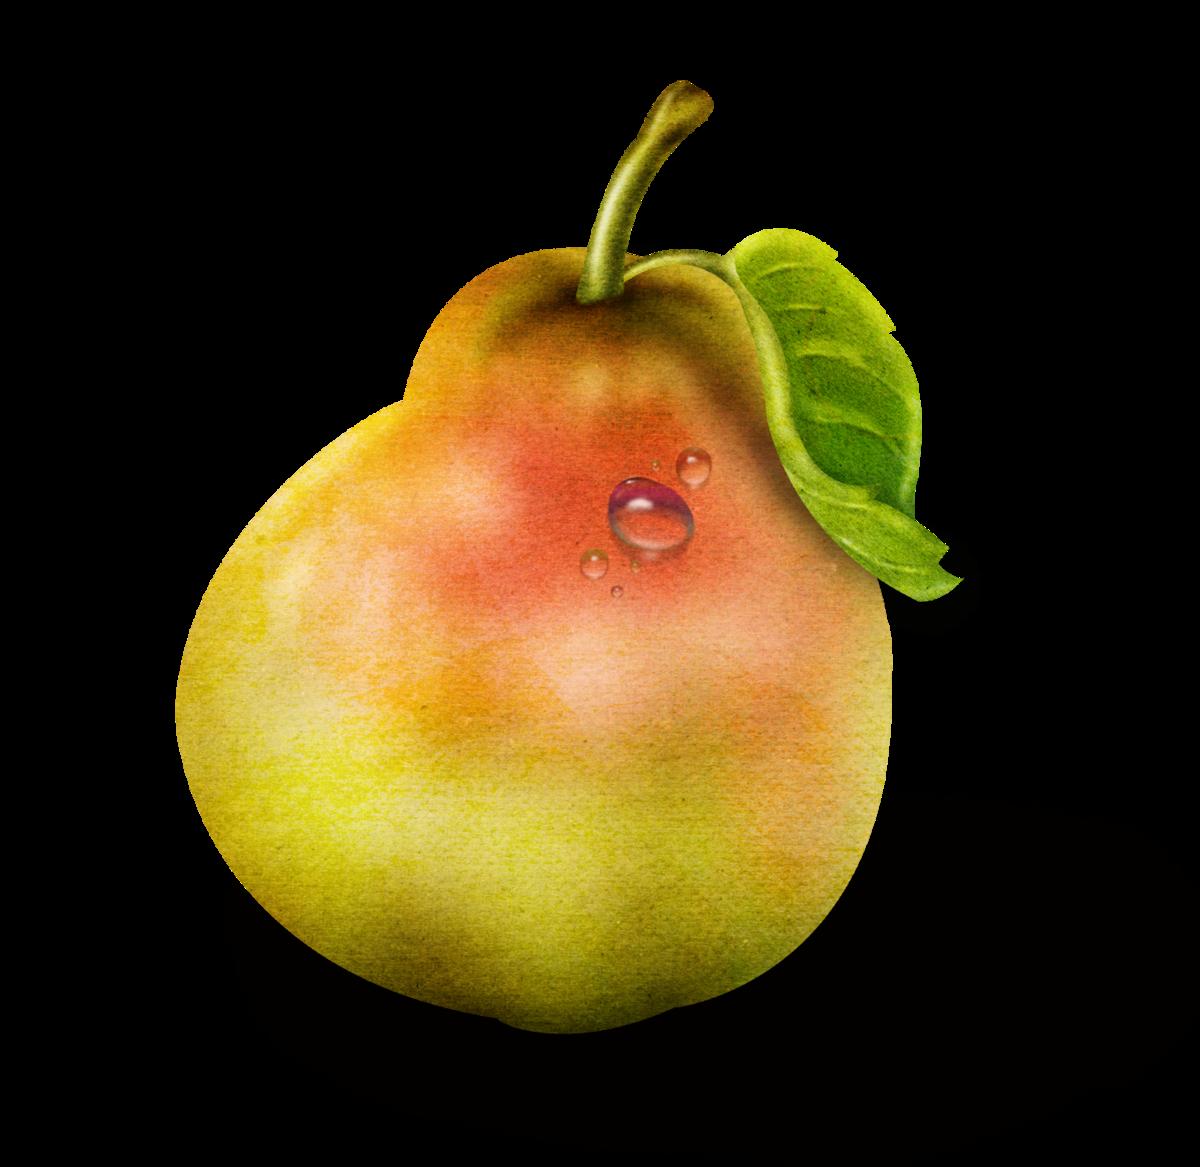 фрукты овощи картинки по одному